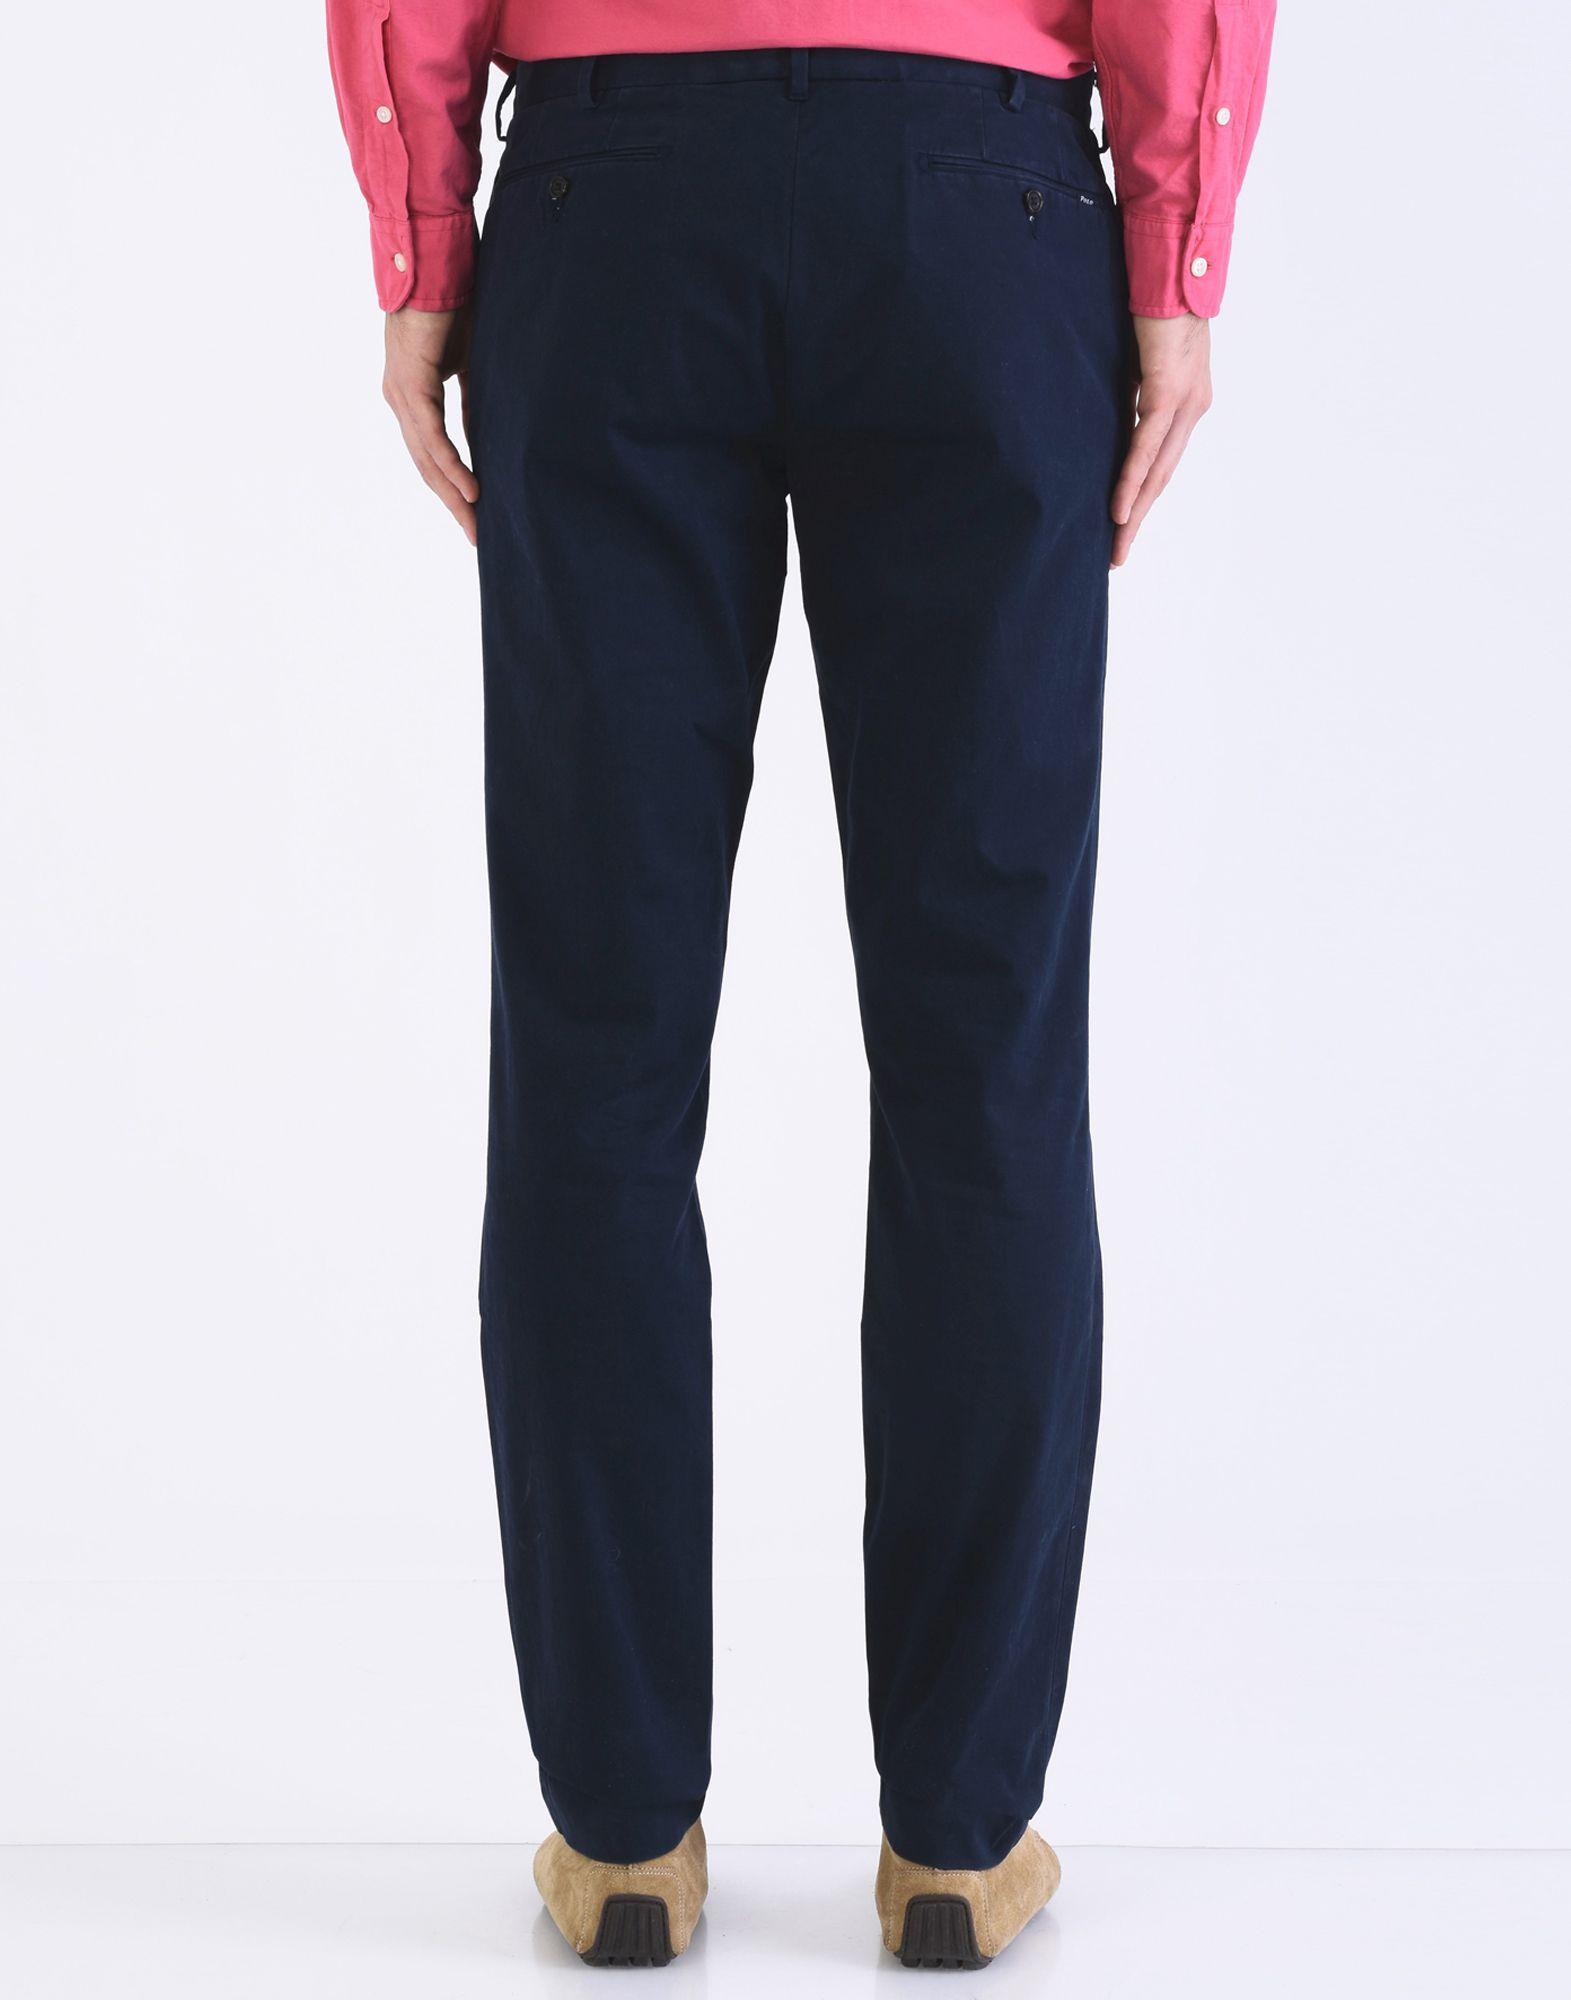 Pantalone Polo Ralph Lauren Stretch Slim Slim Slim Fit Chino - Uomo - 36941200DK a69d88